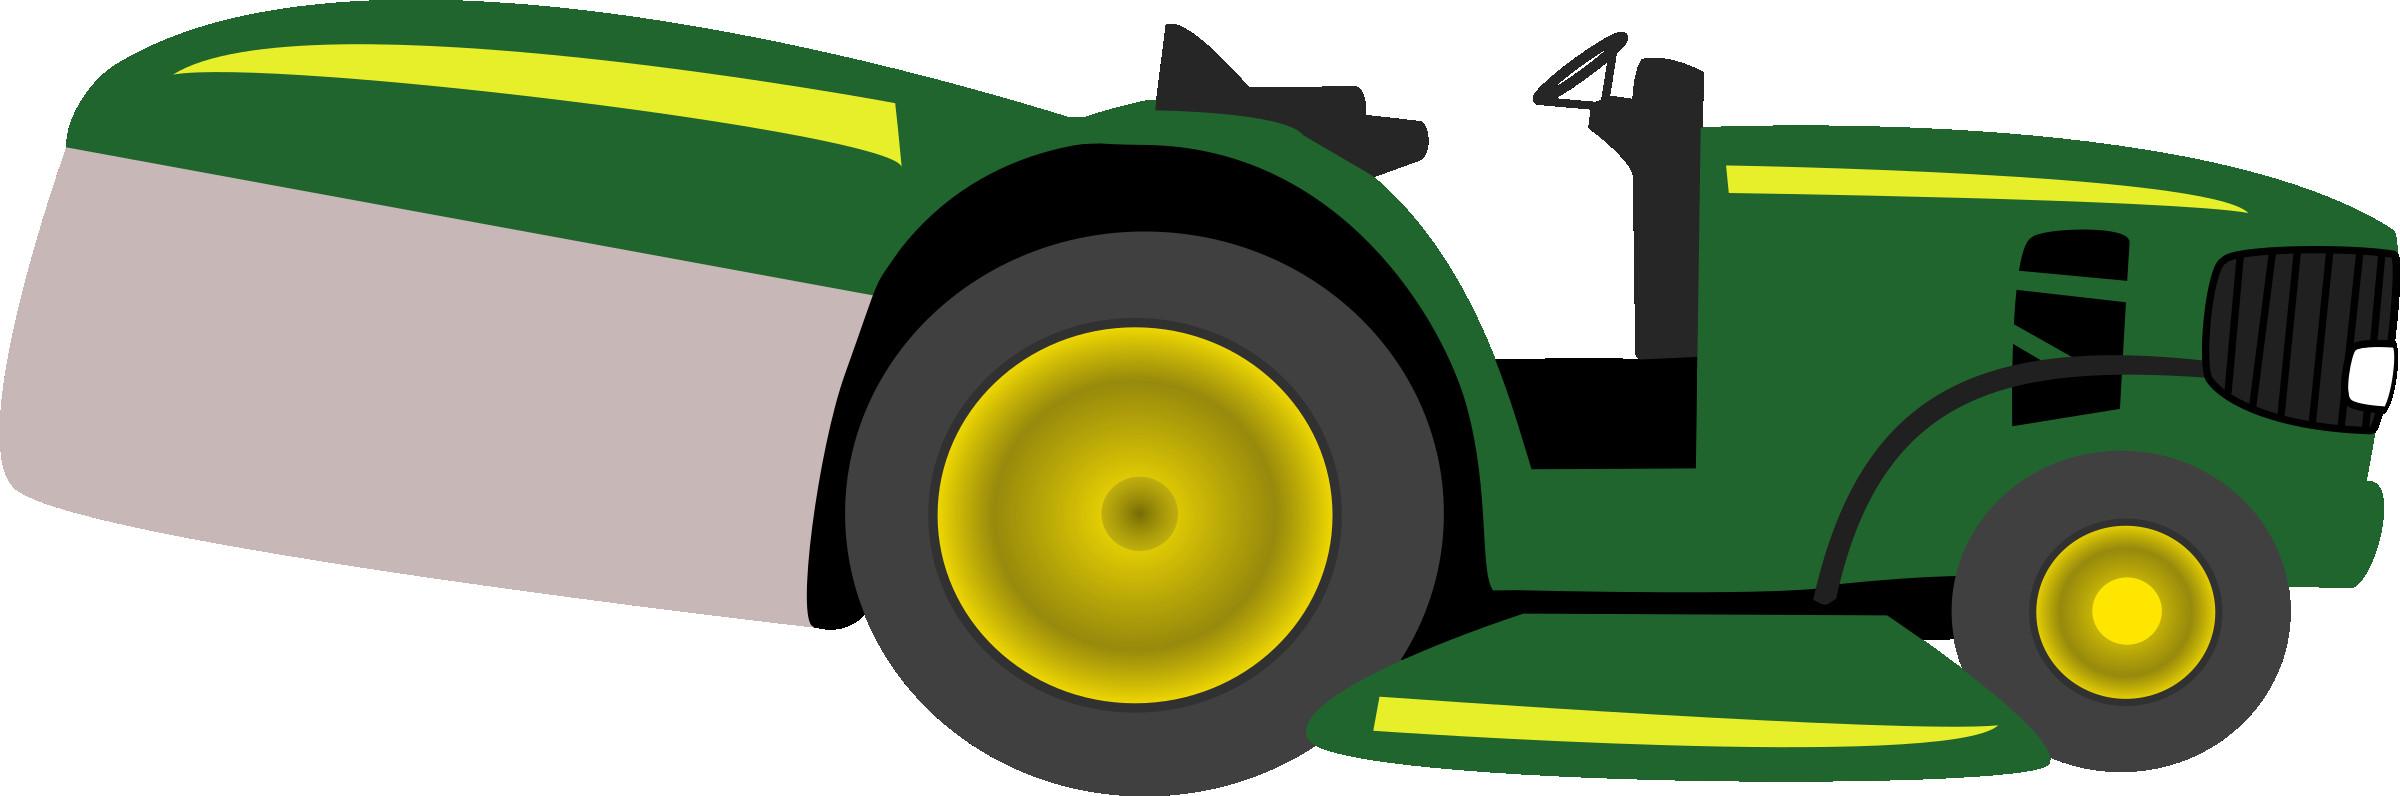 2400x796 John Deere Tractor Agriculture Clip Art Green Cliparts Png